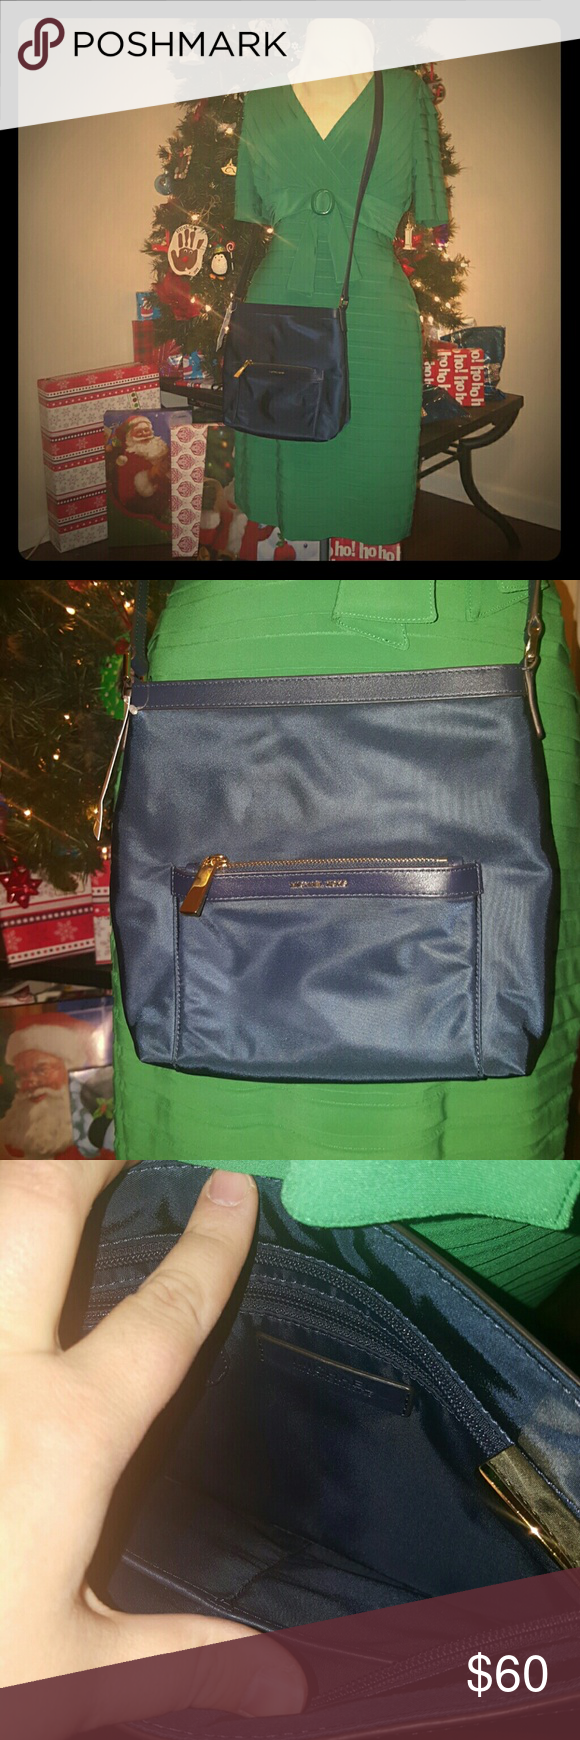 Michael Kors Messenger Bag~Navy Super cute, NWT Michael Kors Messenger Bag. MICHAEL Michael Kors Bags Crossbody Bags